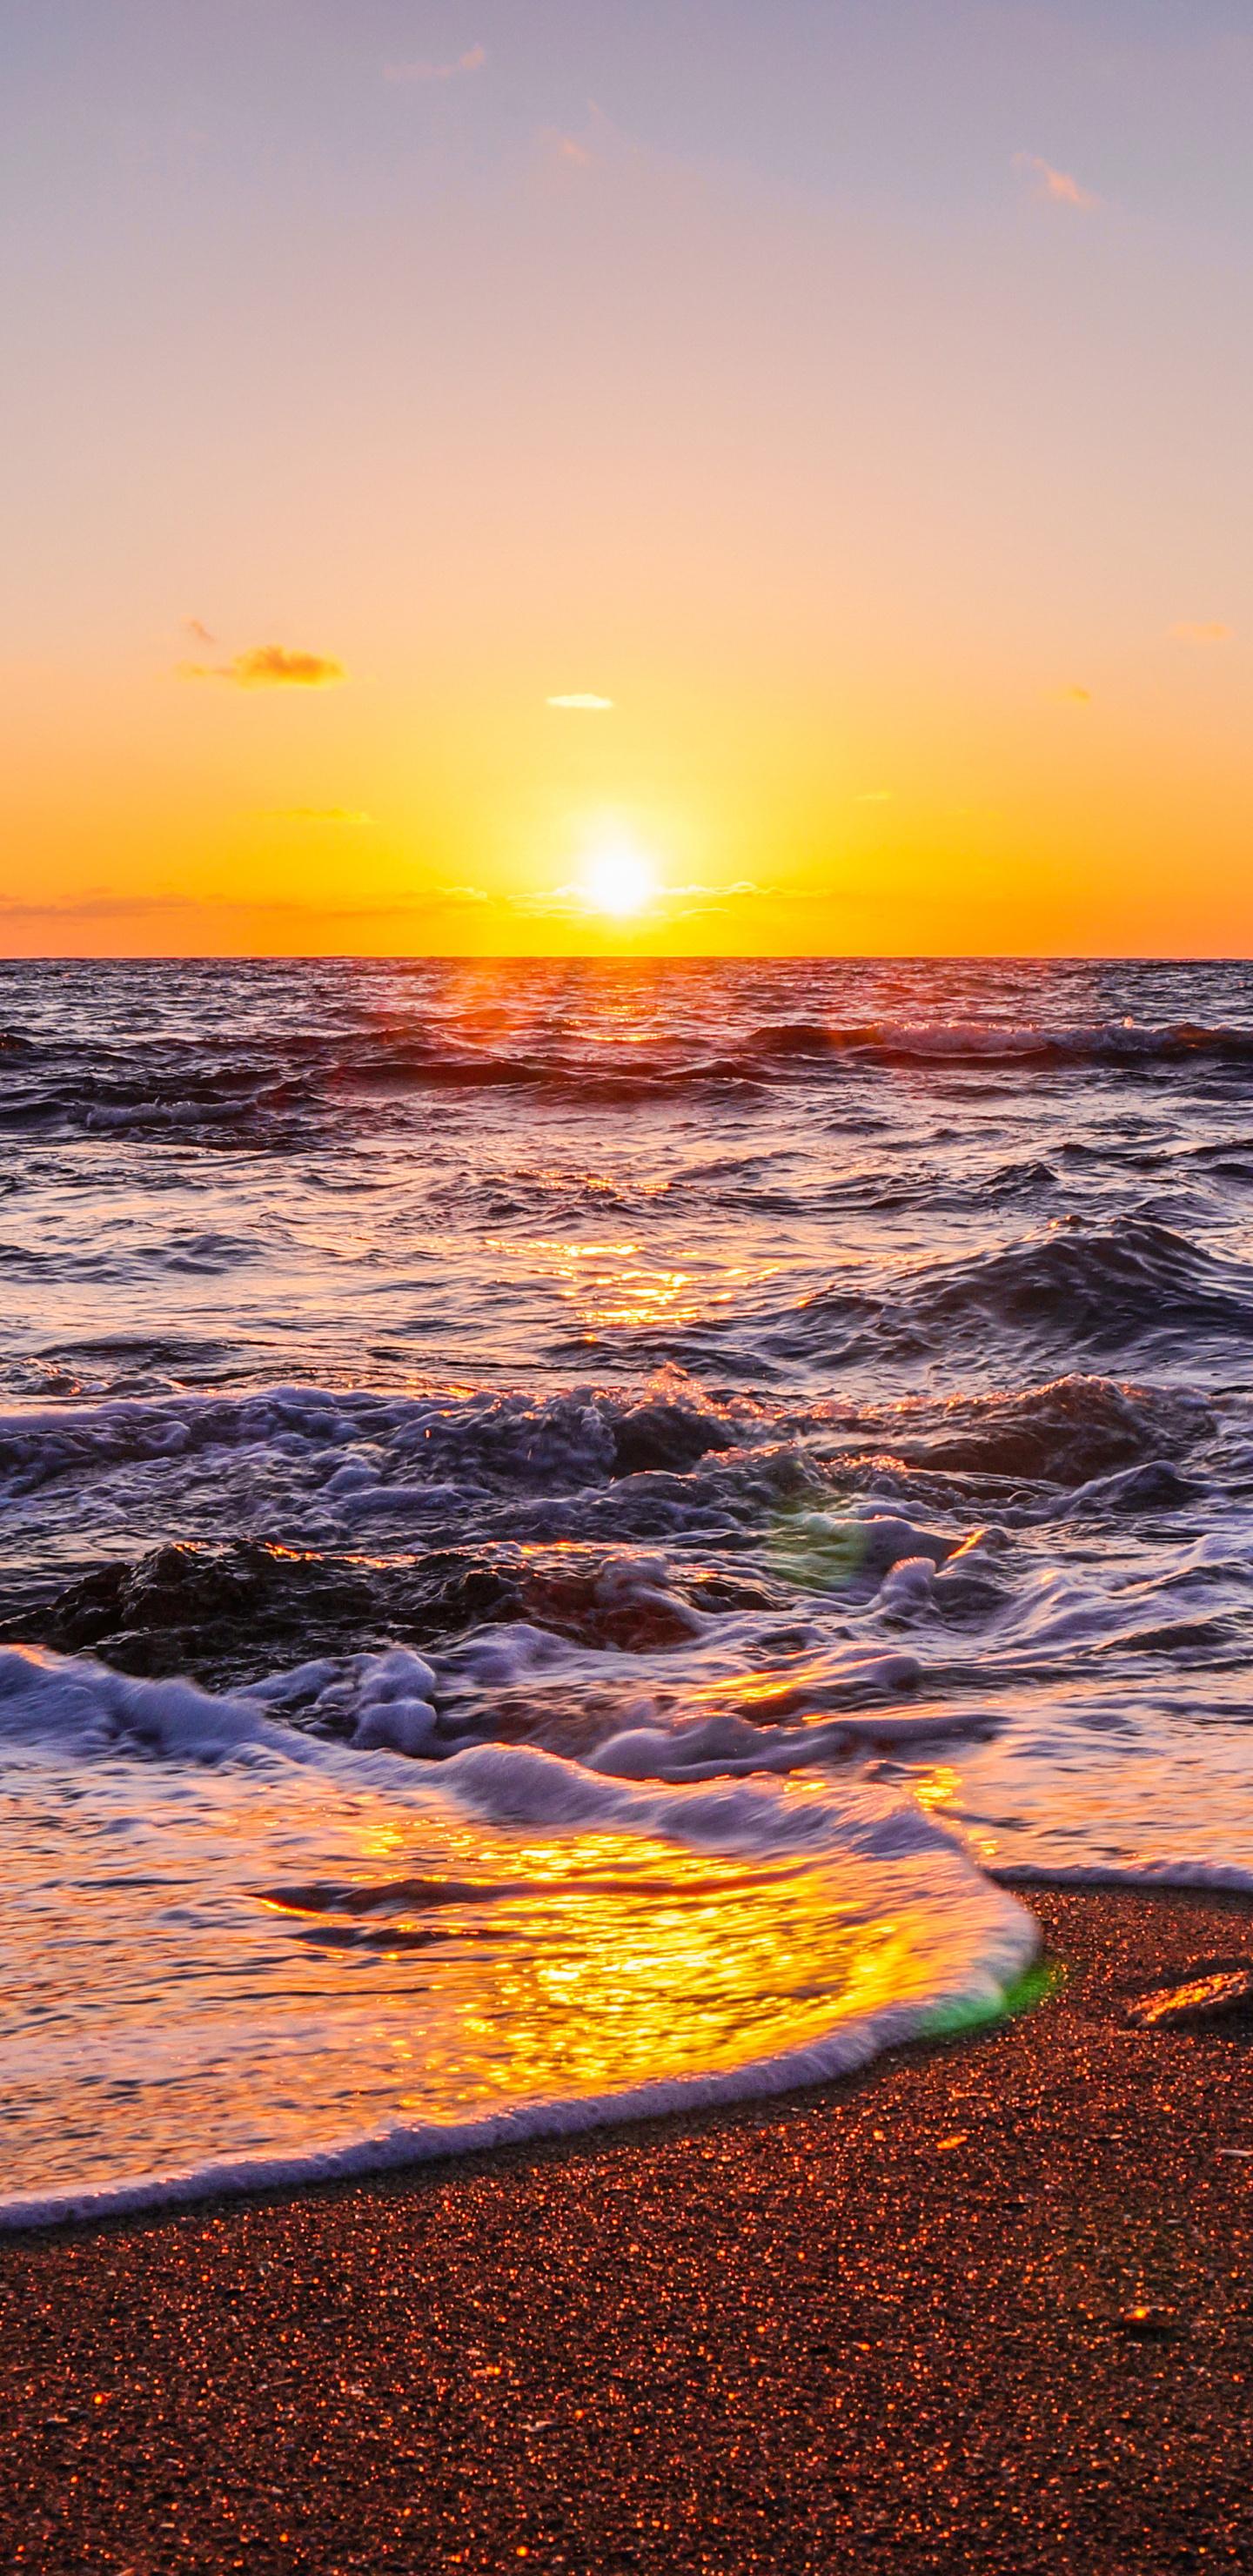 1440x2960 Waves Beach Sunset 5k Samsung Galaxy Note 9,8 ...